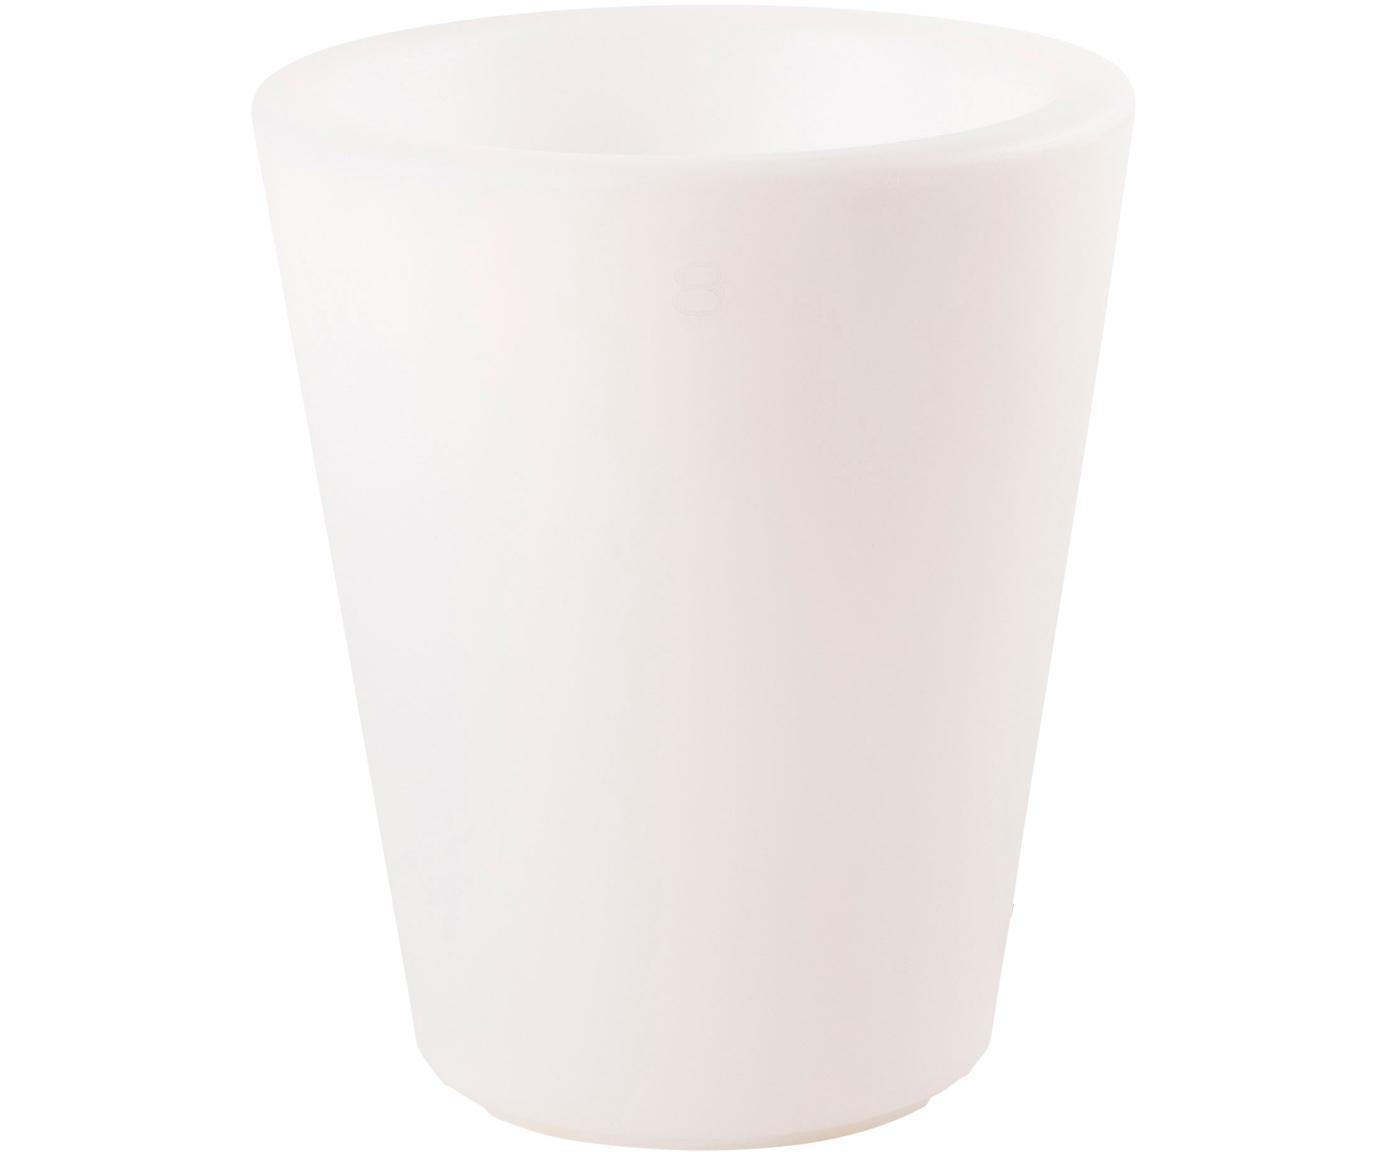 Lampada da esterno portatile Shining Pot, Materiale sintetico, Bianco, Ø 34 x Alt. 39 cm